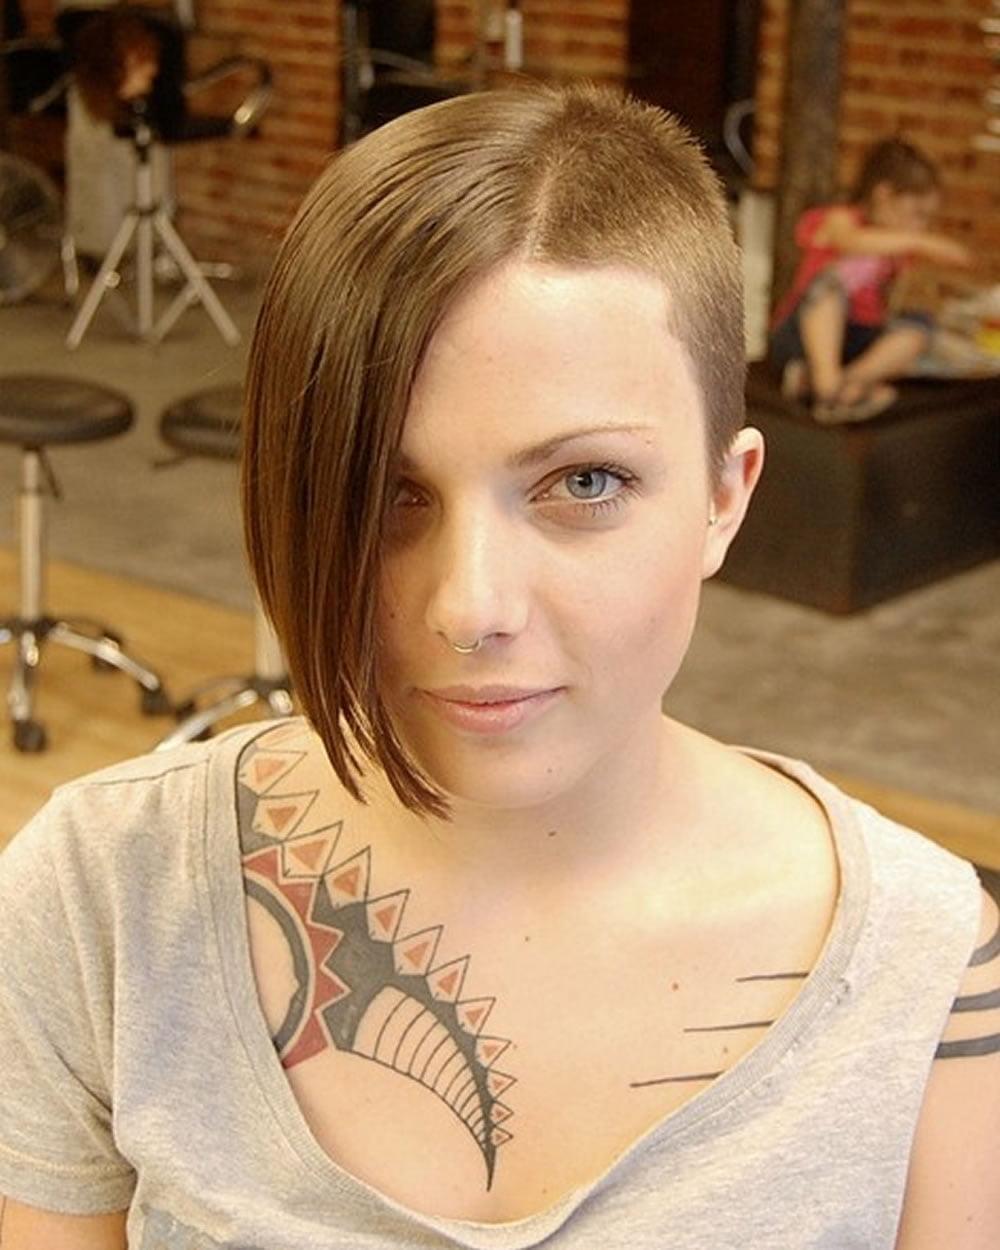 Asymmetrical Short Hair 2018 – 33 Haute Short Hairstyles ...